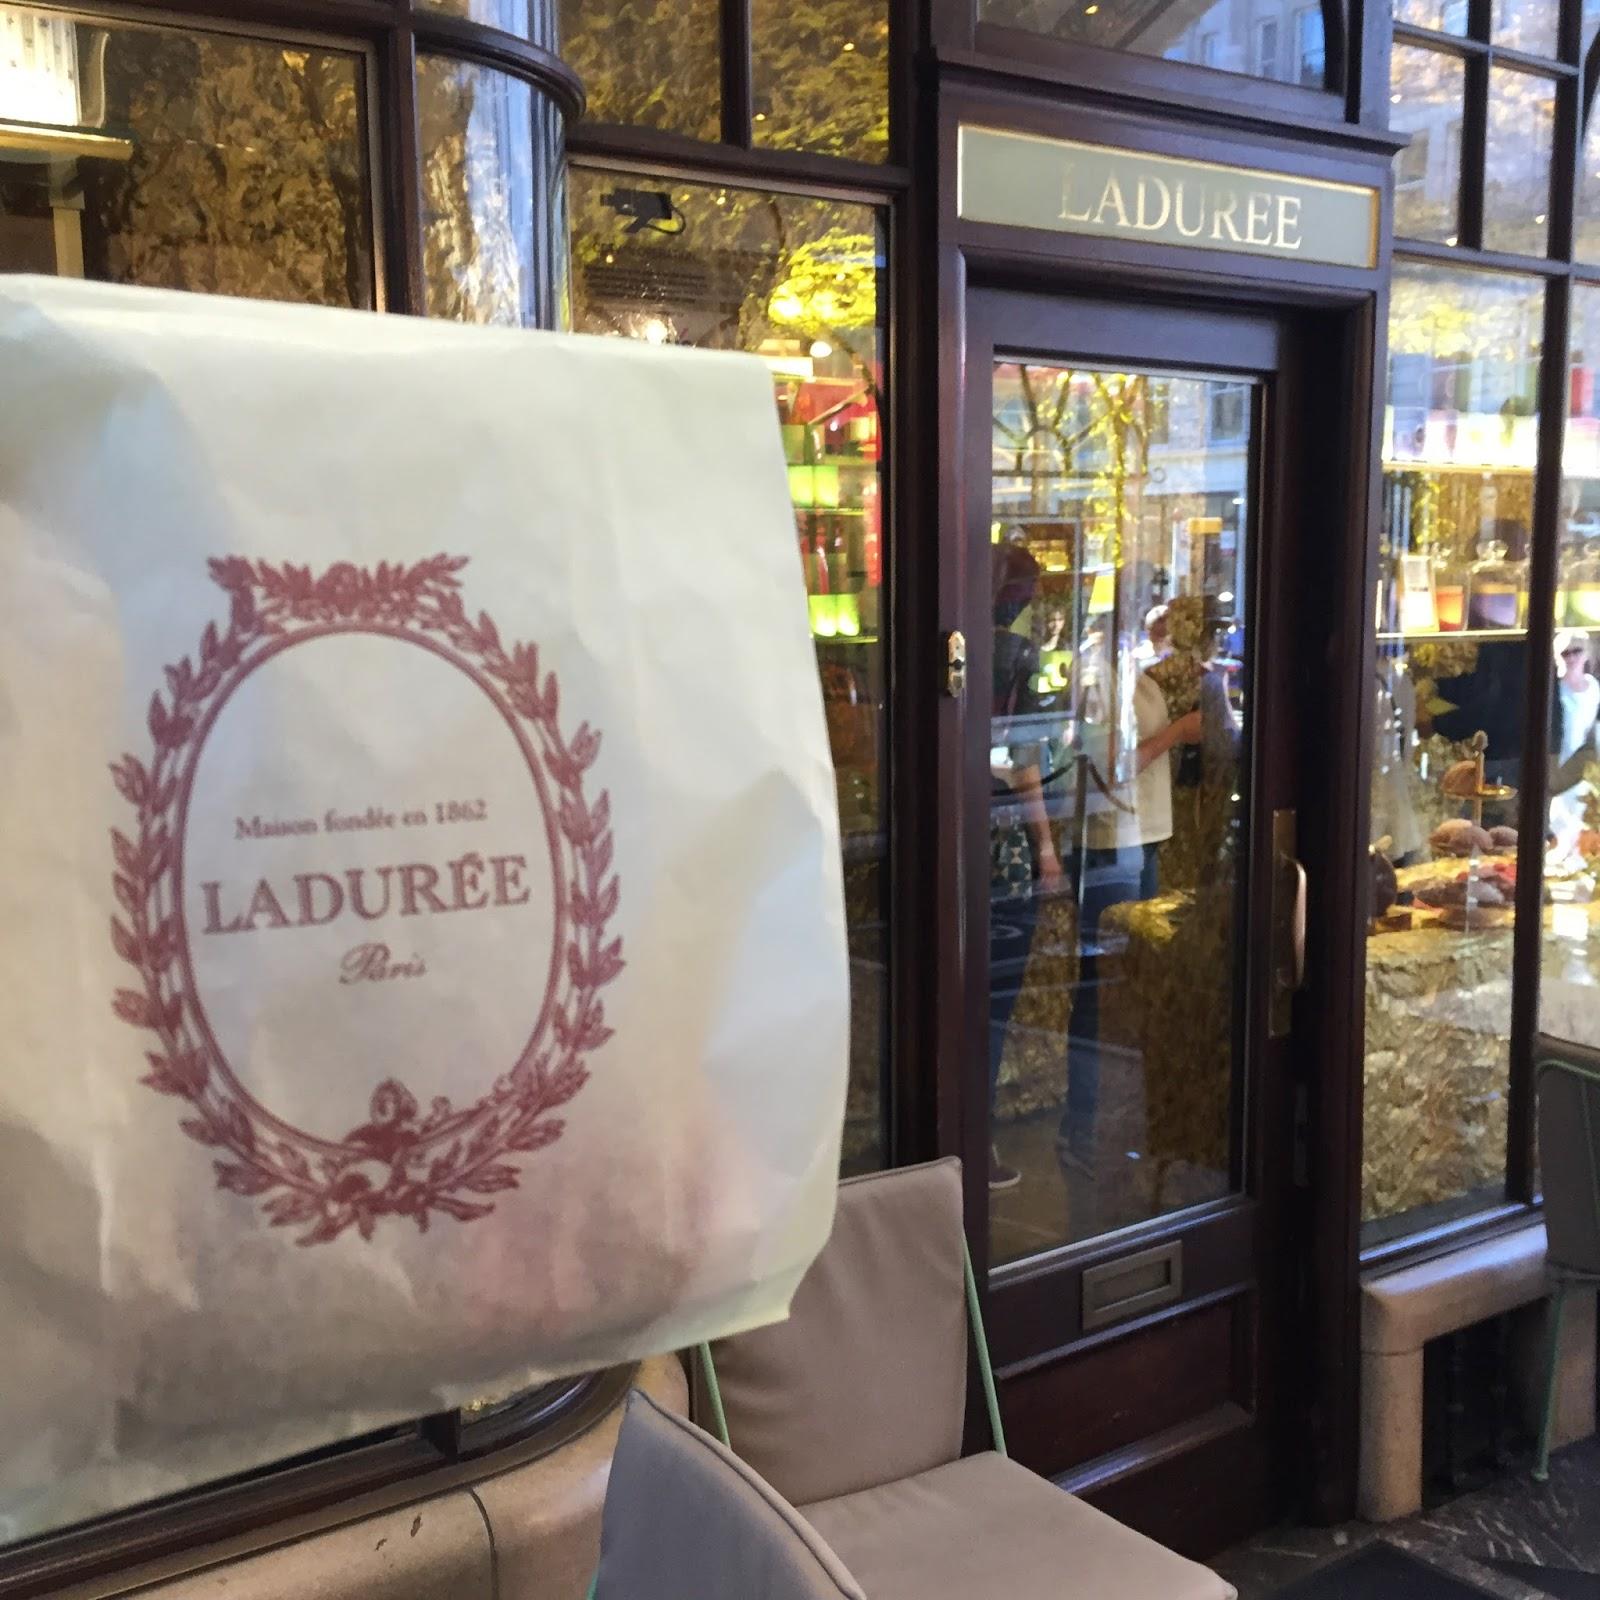 Ladurée Macarons Burlington arcade